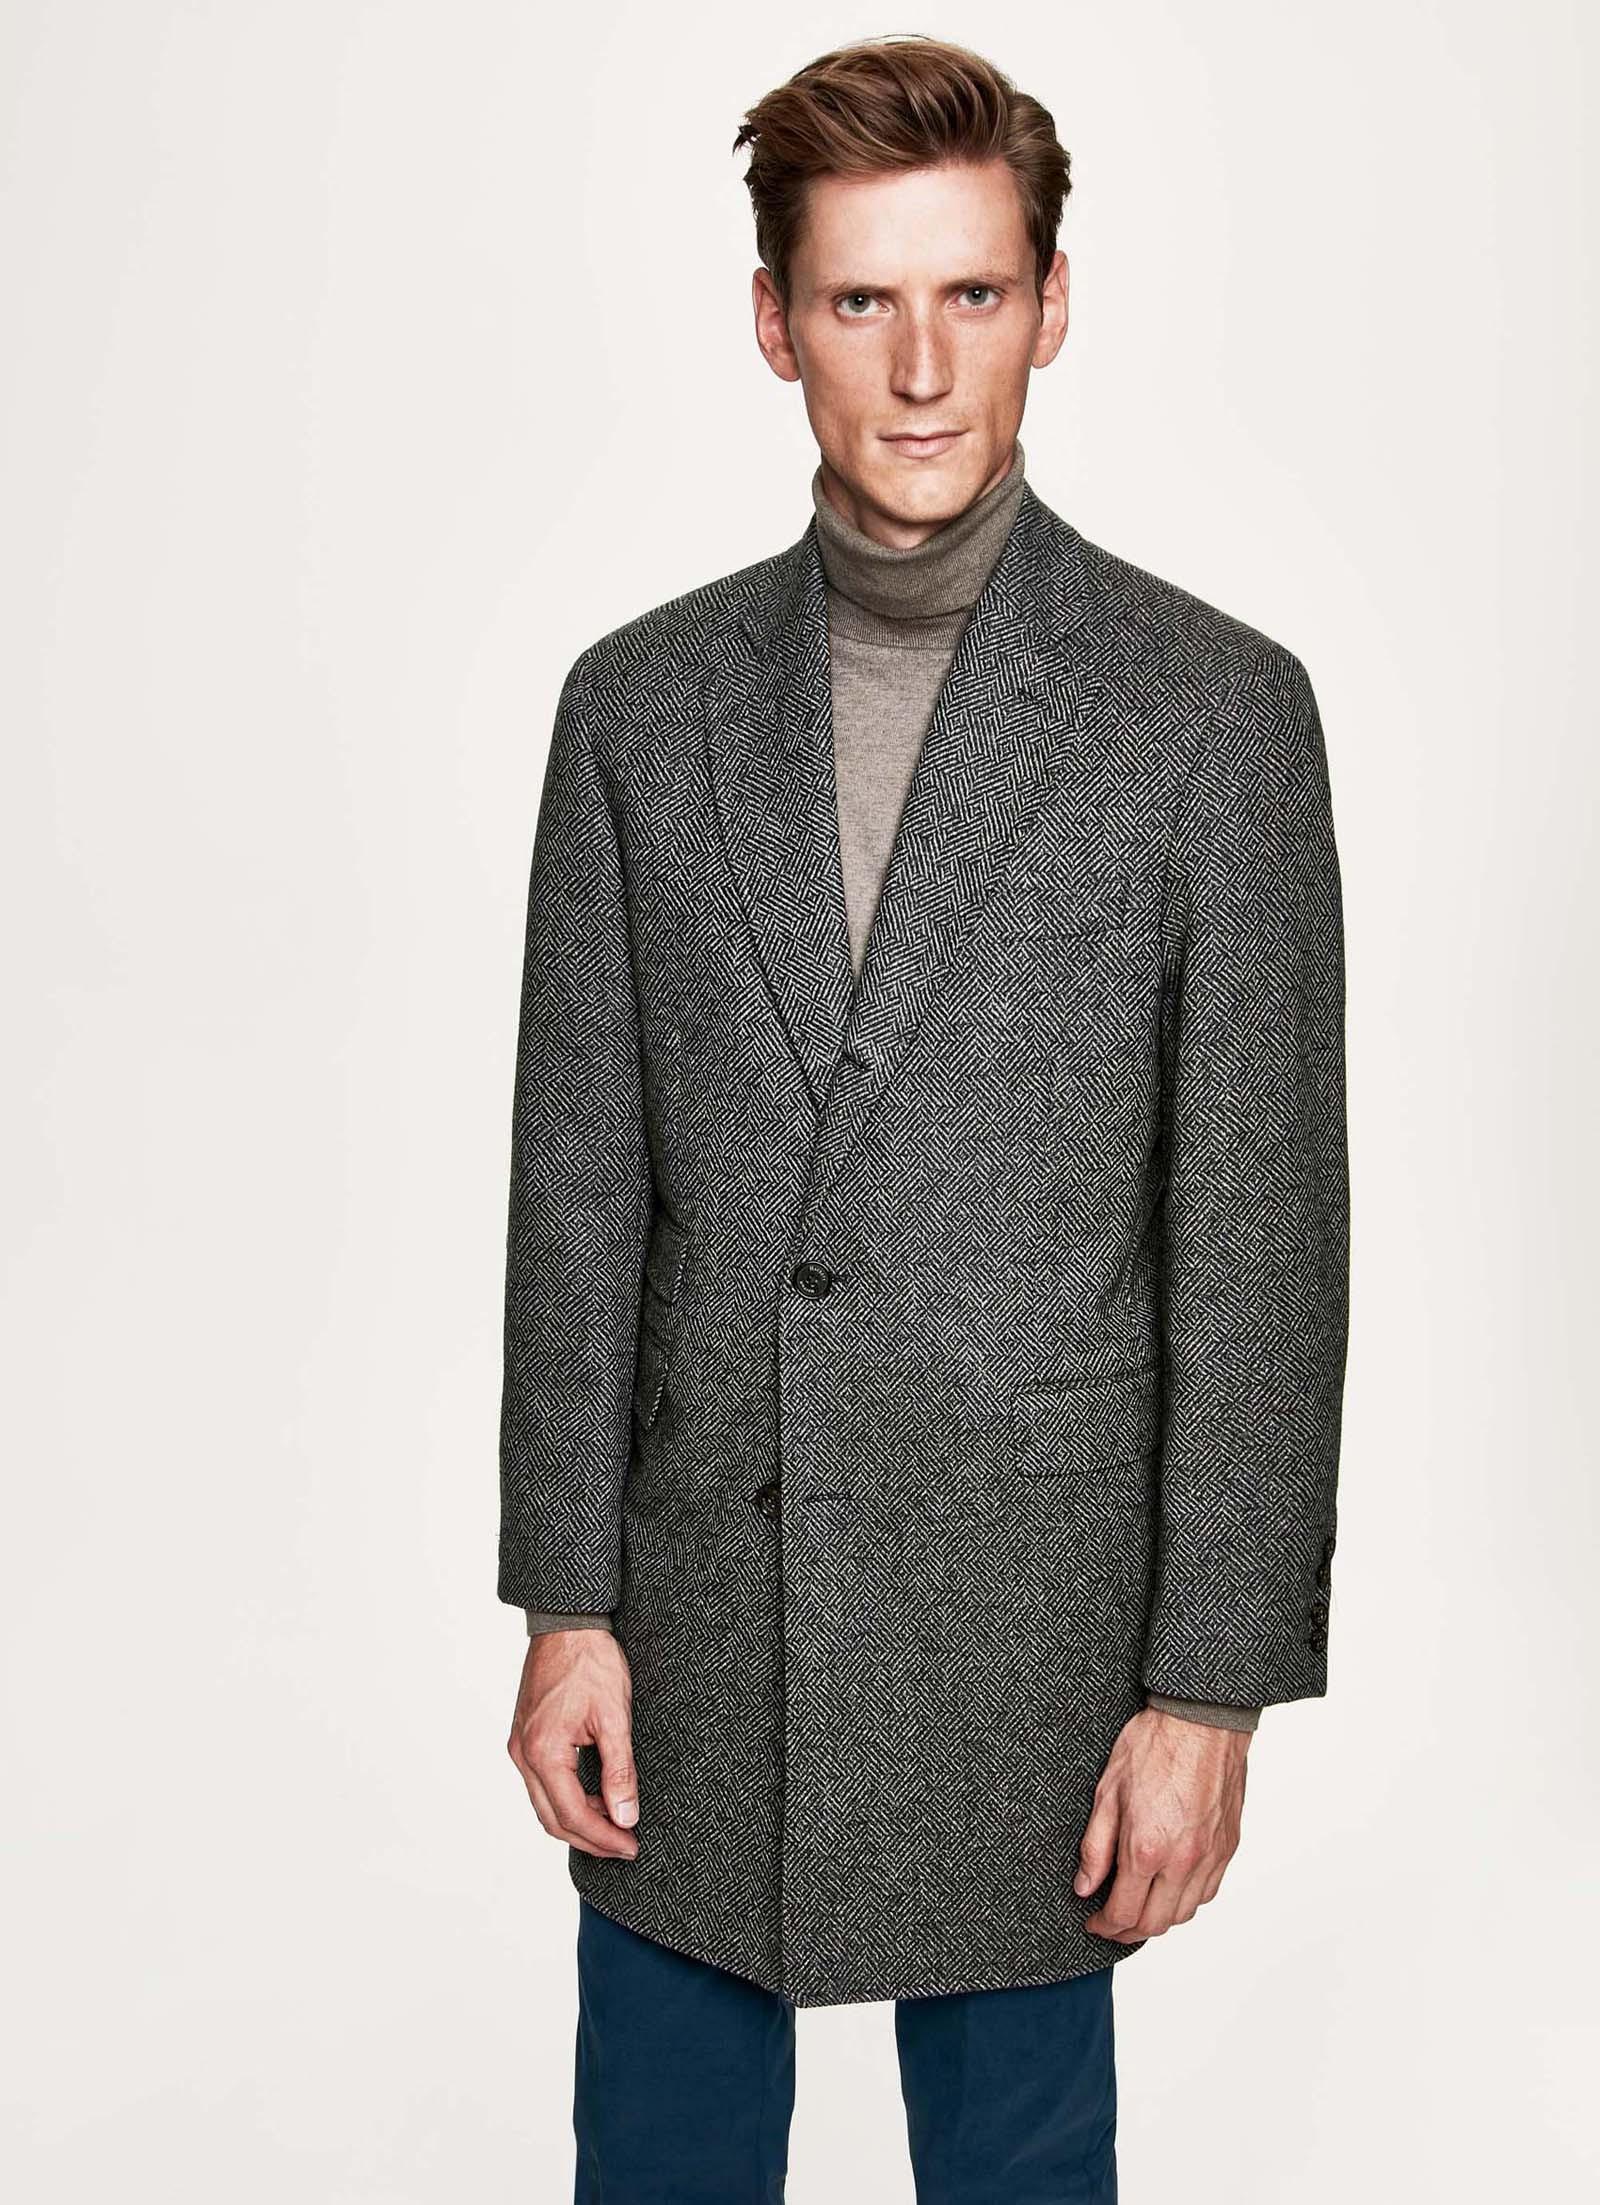 ddb5f139963 Hackett Herringbone Chadwick Overcoat in Gray for Men - Lyst